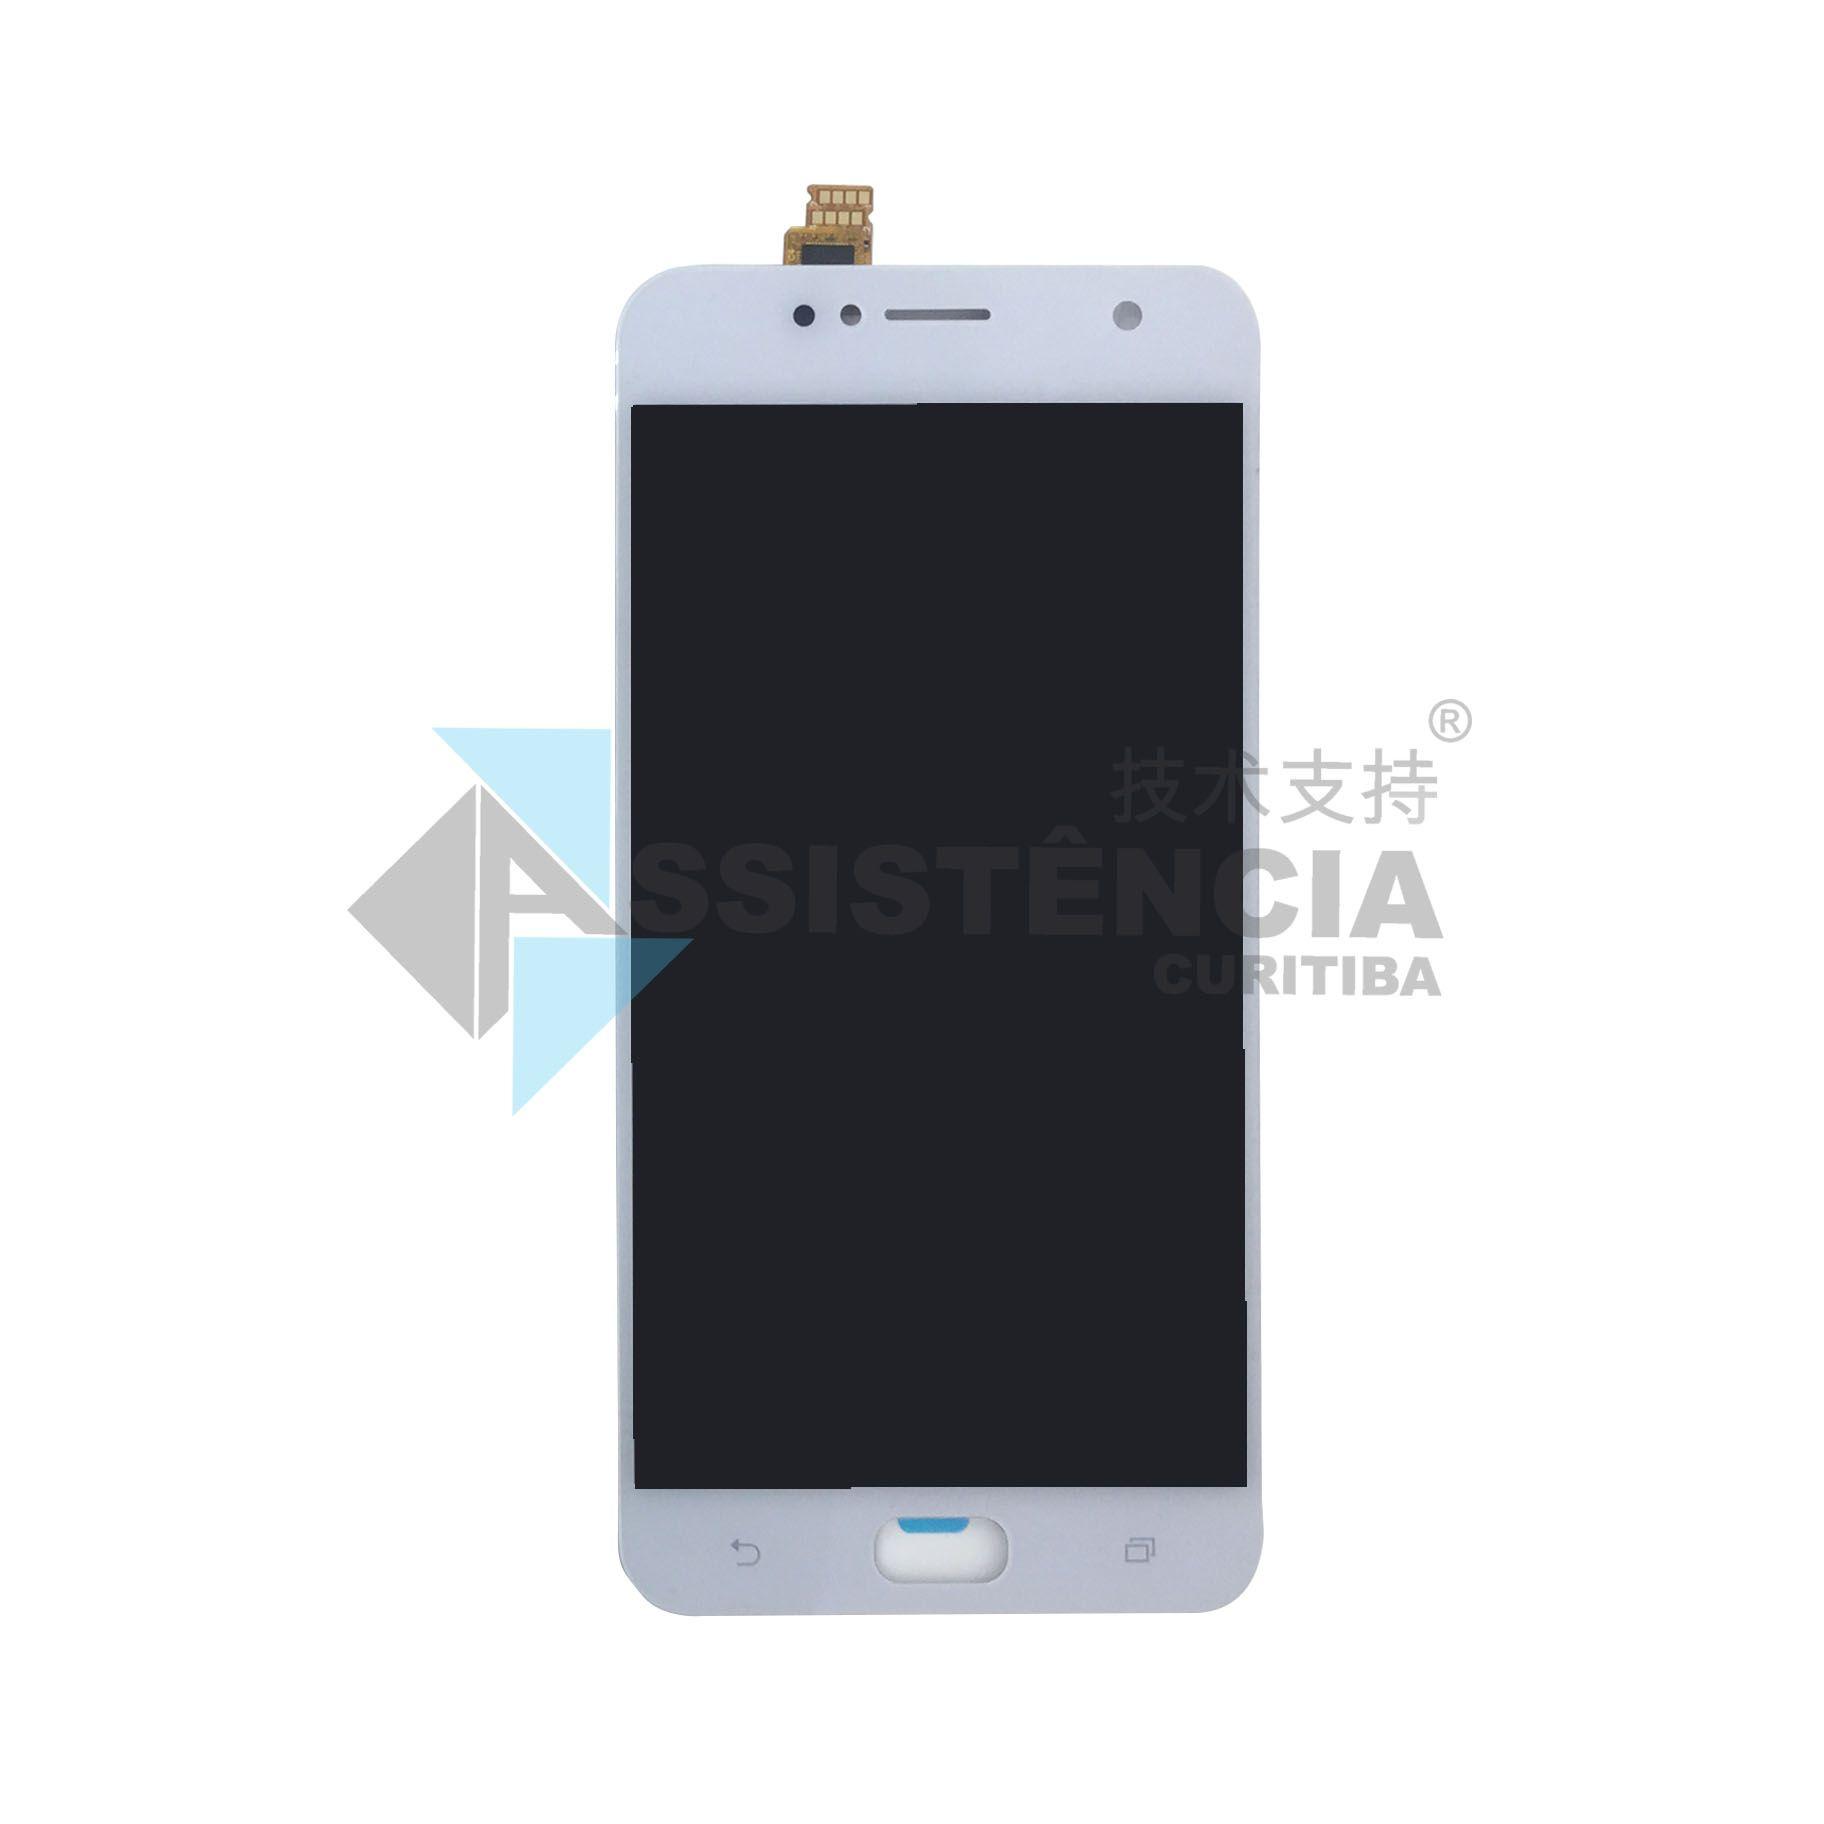 Tela Display Asus Zenfone 4 Selfie Zb553Kl Branco